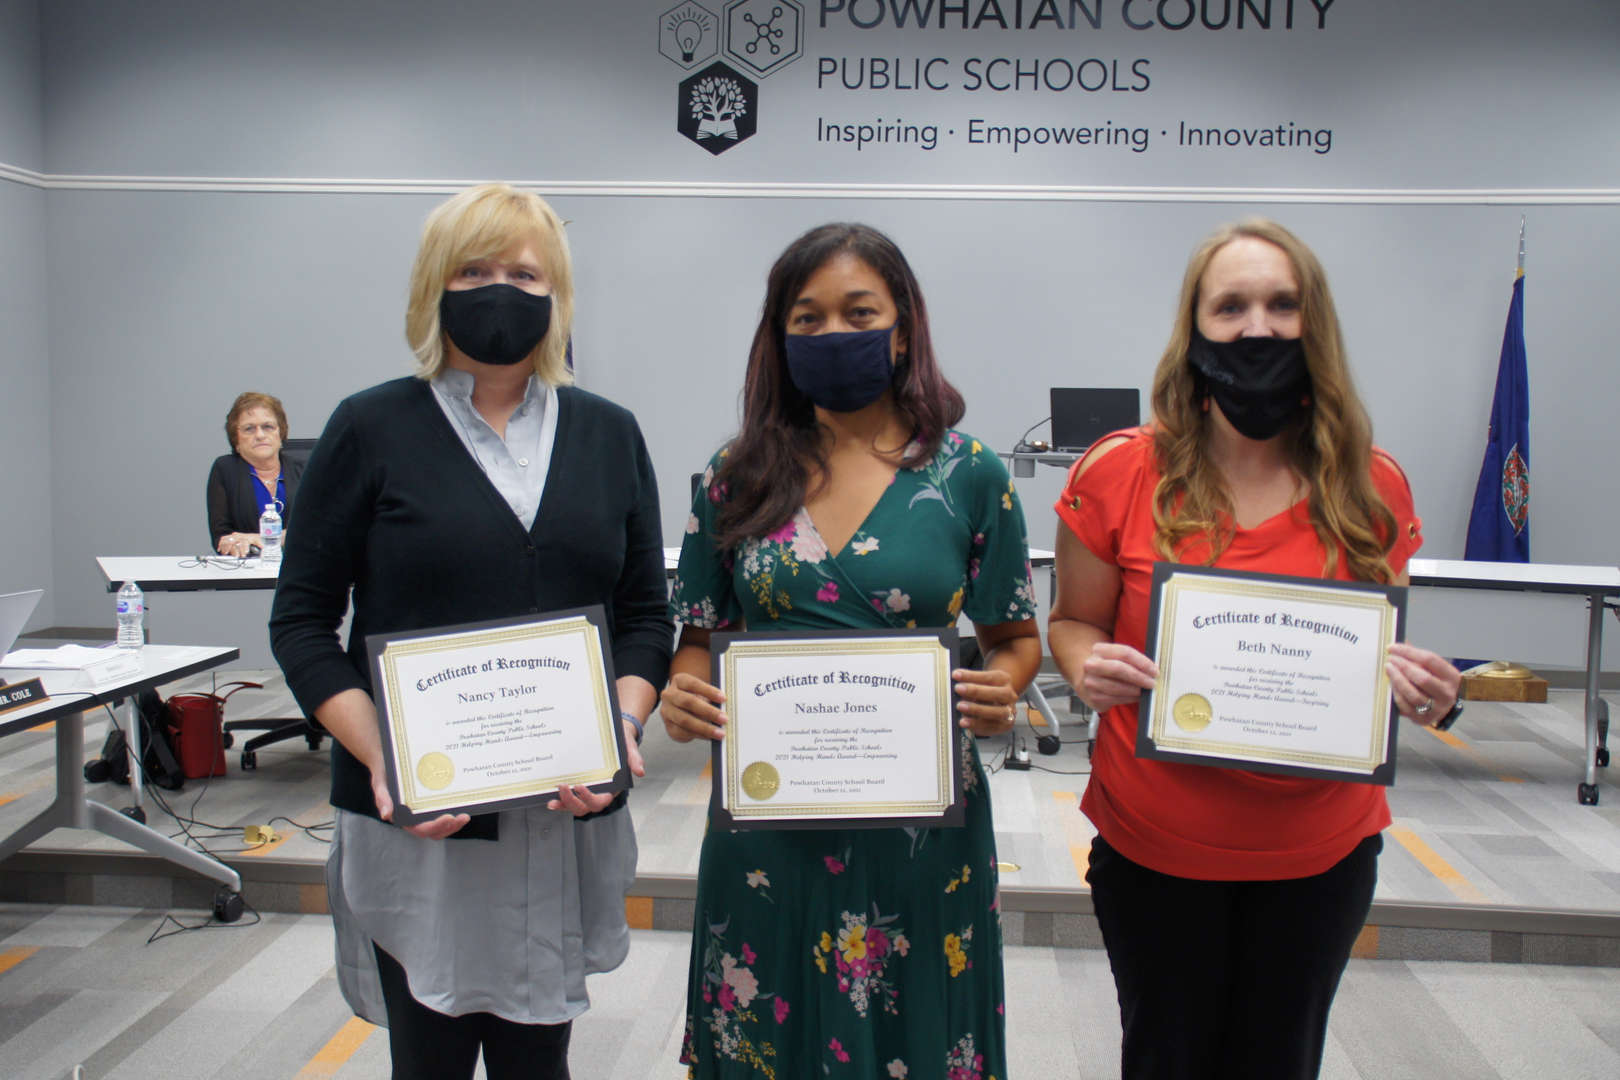 21-22 Helping Hand Award Recipients